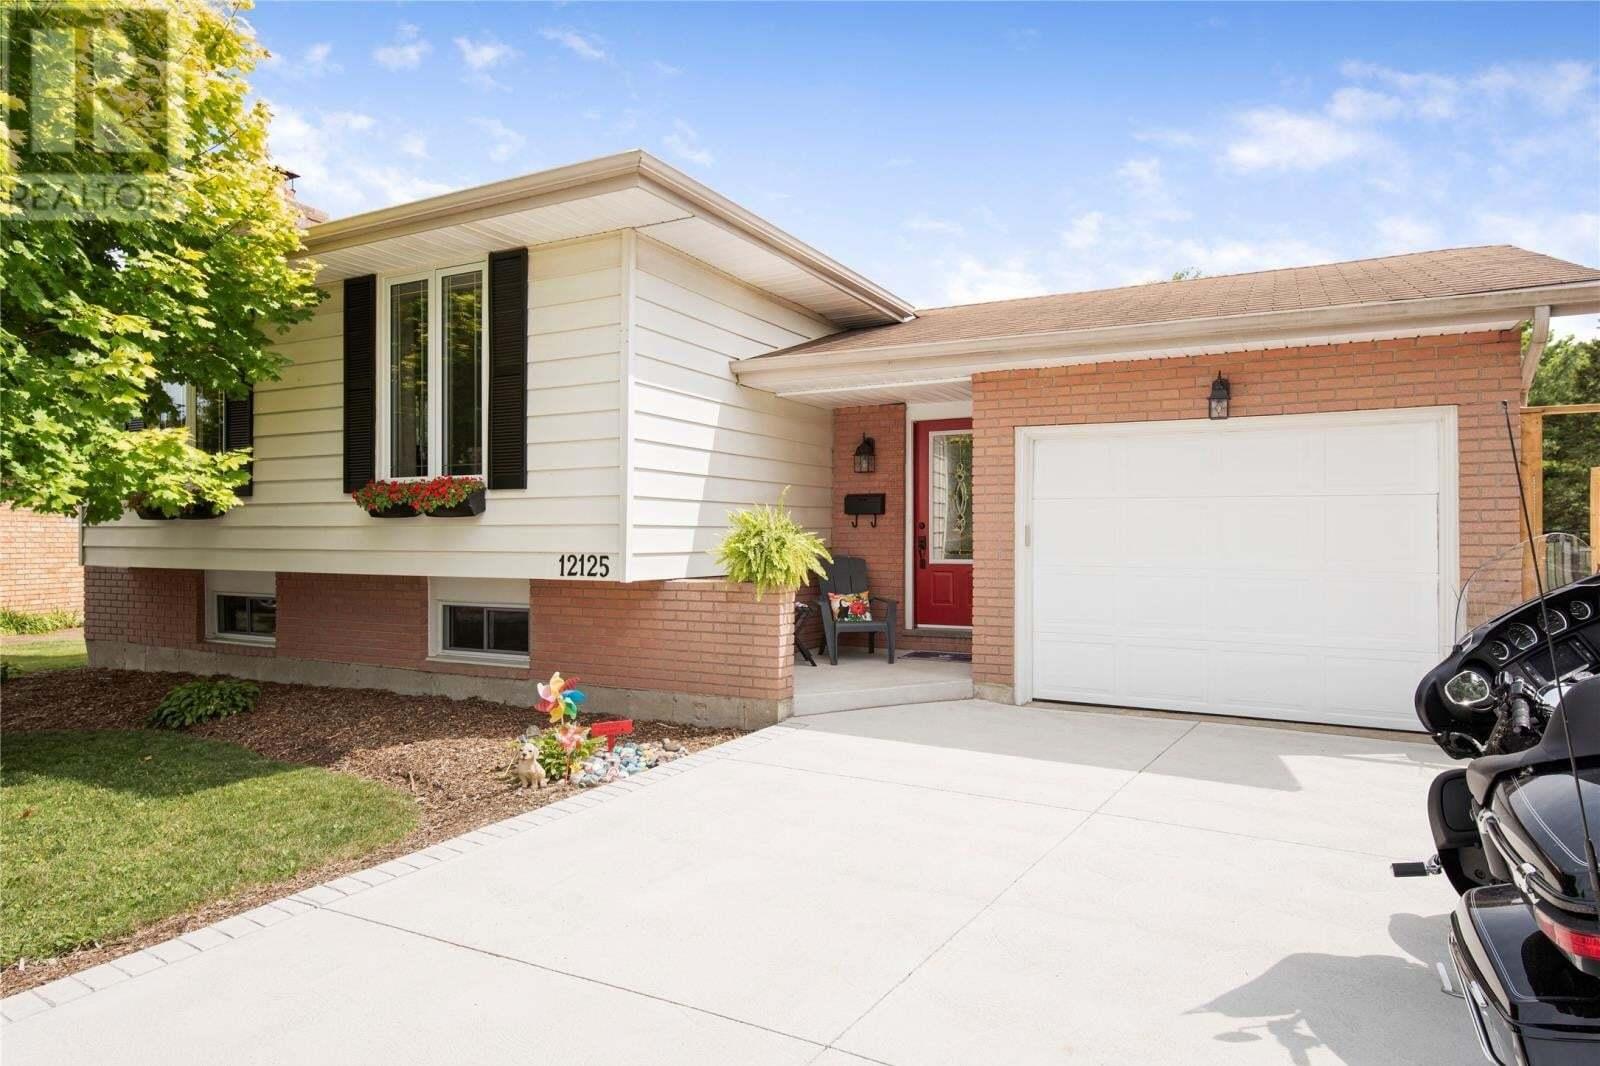 House for sale at 12125 Valente Ct Tecumseh Ontario - MLS: 20009481